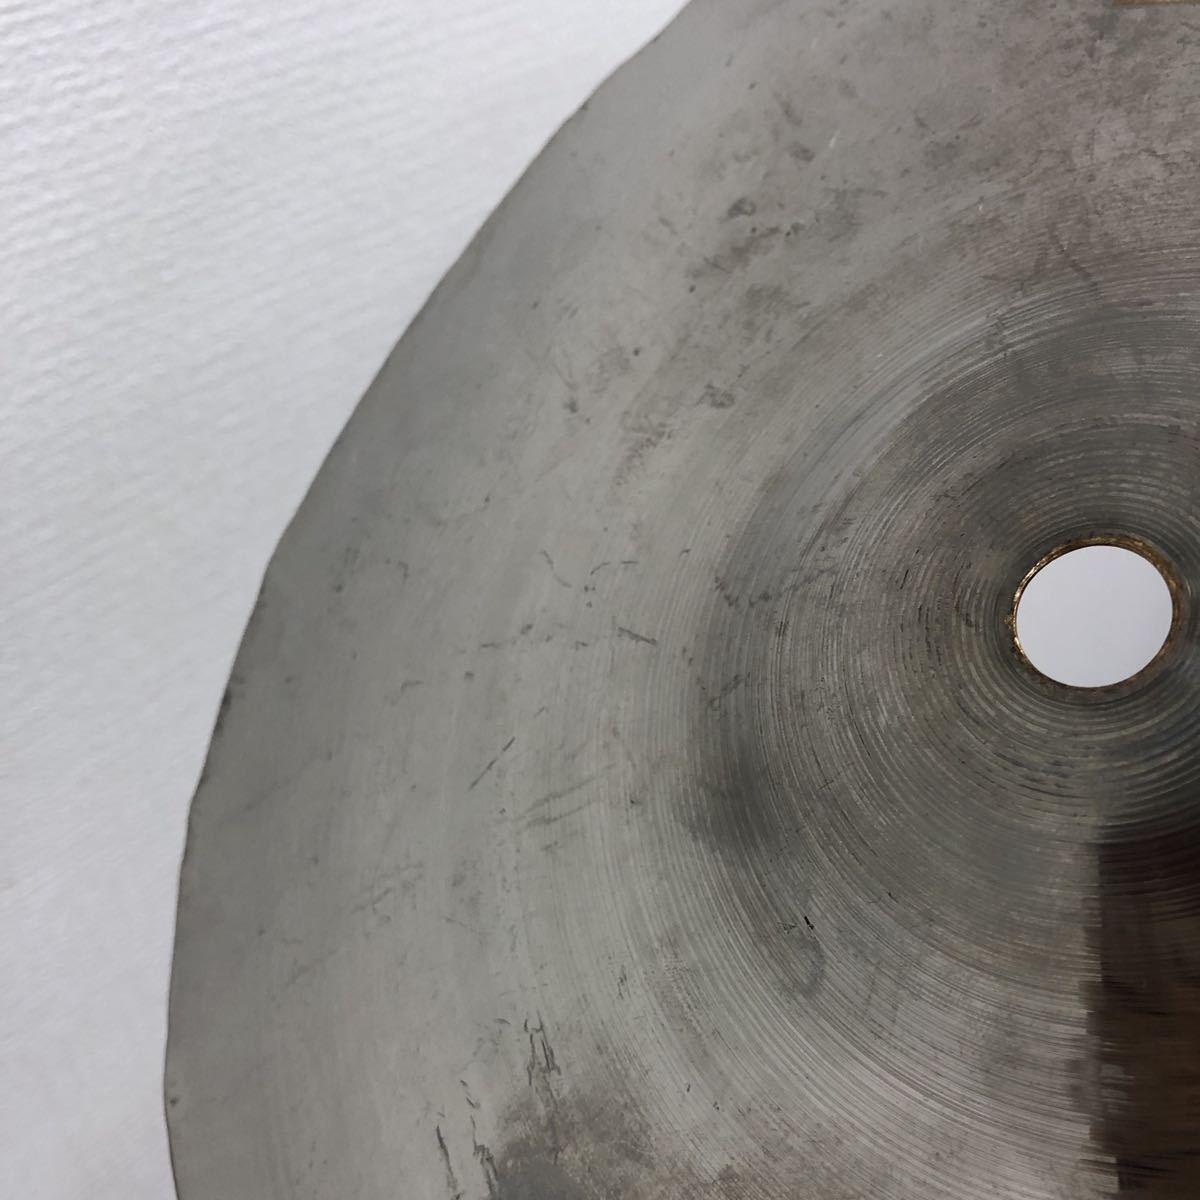 □Zildjian ジルジャン ZXT TITANIUM Flash Splash シンバル ドラム 打楽器 楽器 10インチ スプラッシュ パーカッション □21073005_画像9